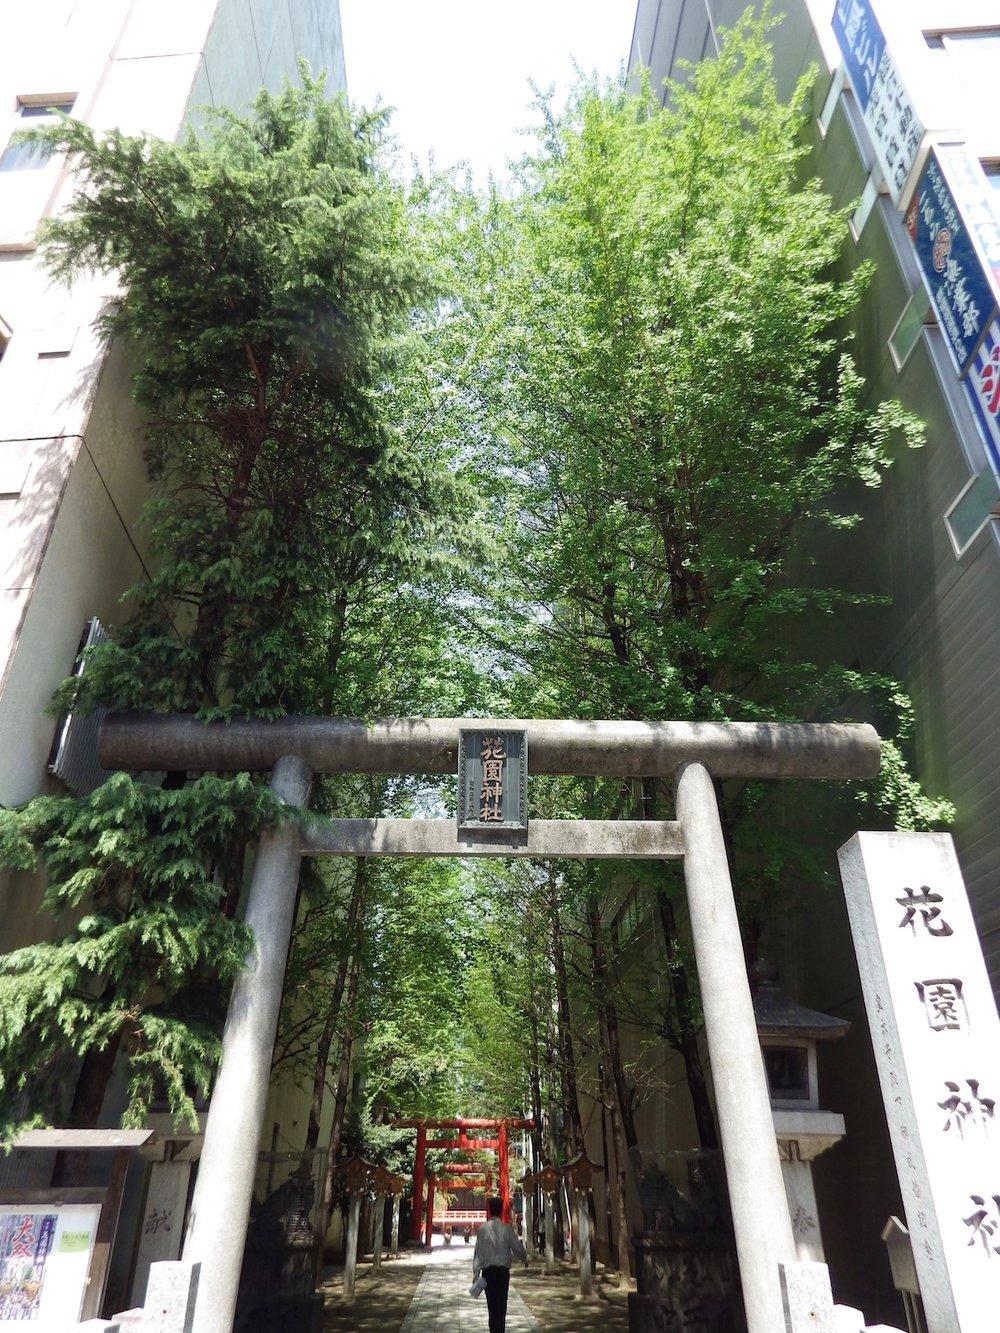 Kabukicho_085_3x4.jpg